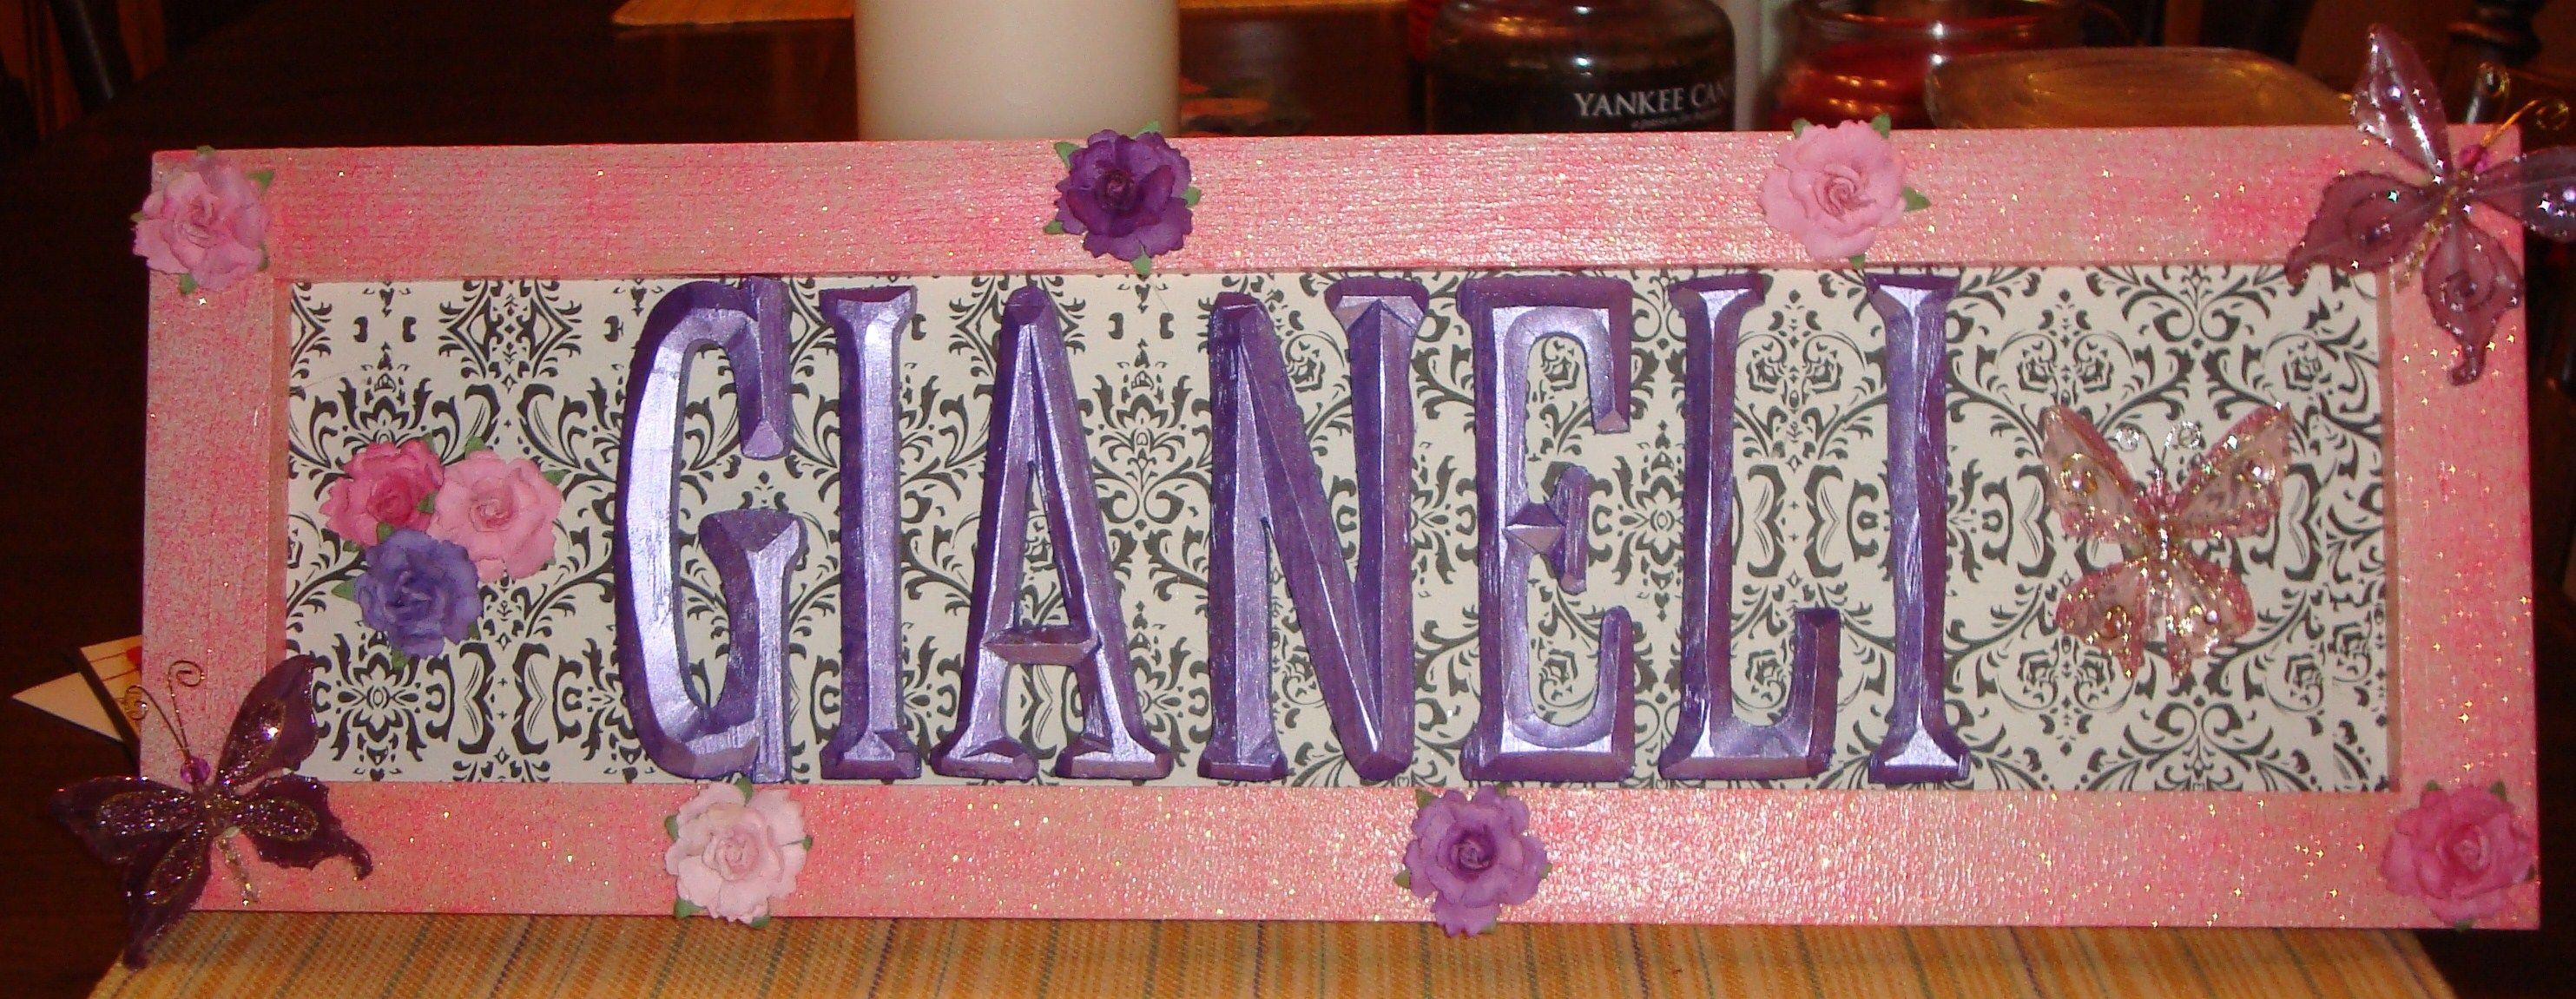 name frame | craftiness | Pinterest | Name frame, Frames and Names